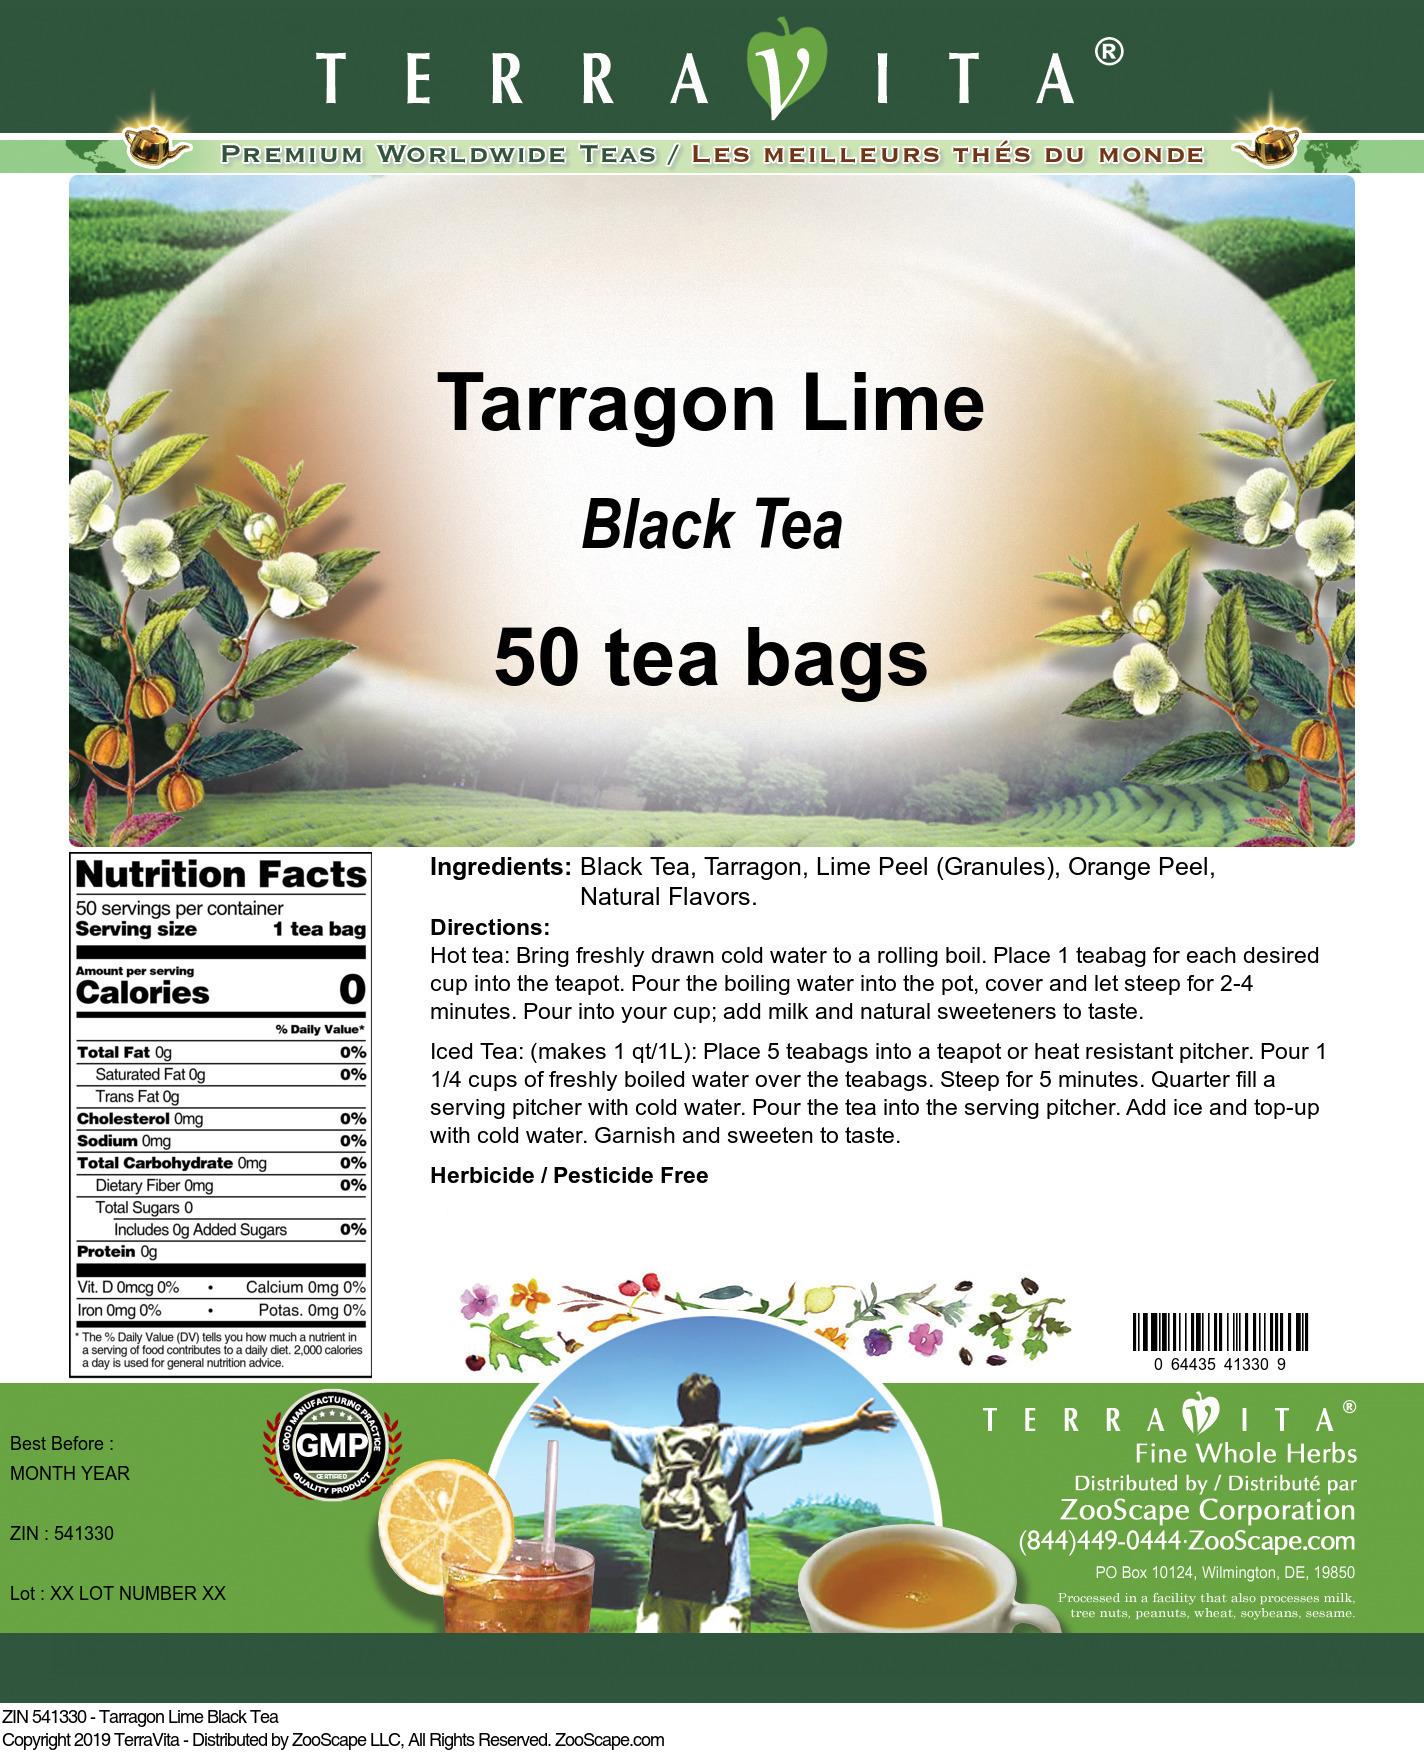 Tarragon Lime Black Tea